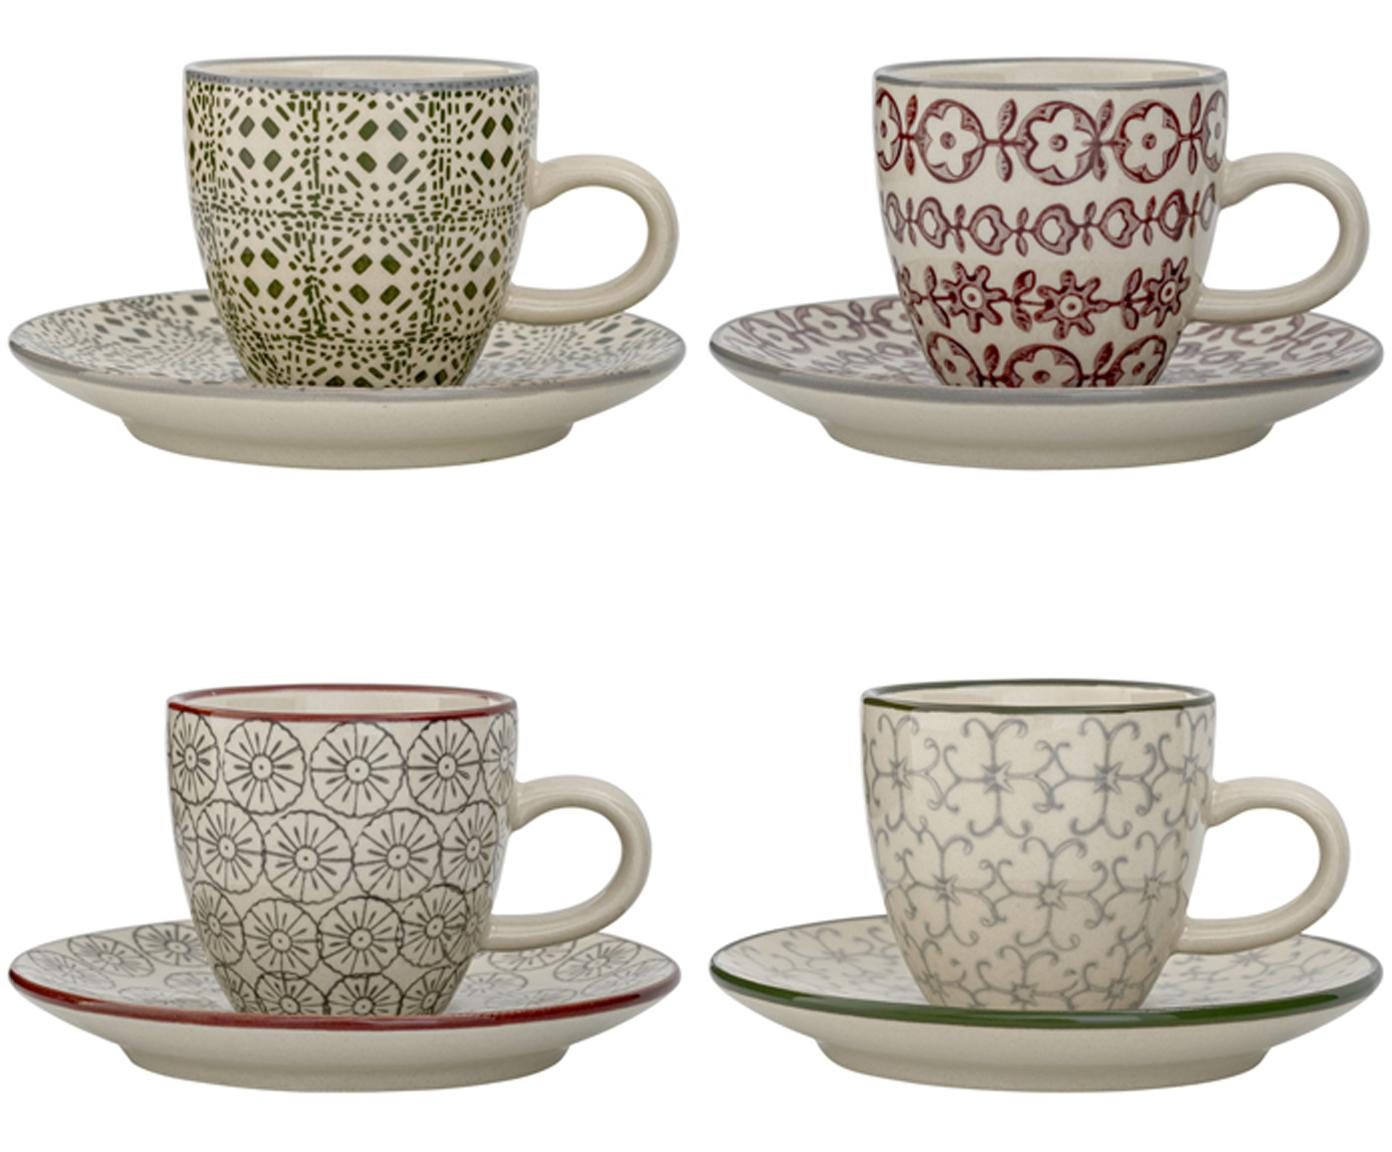 Set de tazas de café Karine, 8pzas., Gres, Blanco, verde, rojo, gris, Ø 6 x Al 6 cm